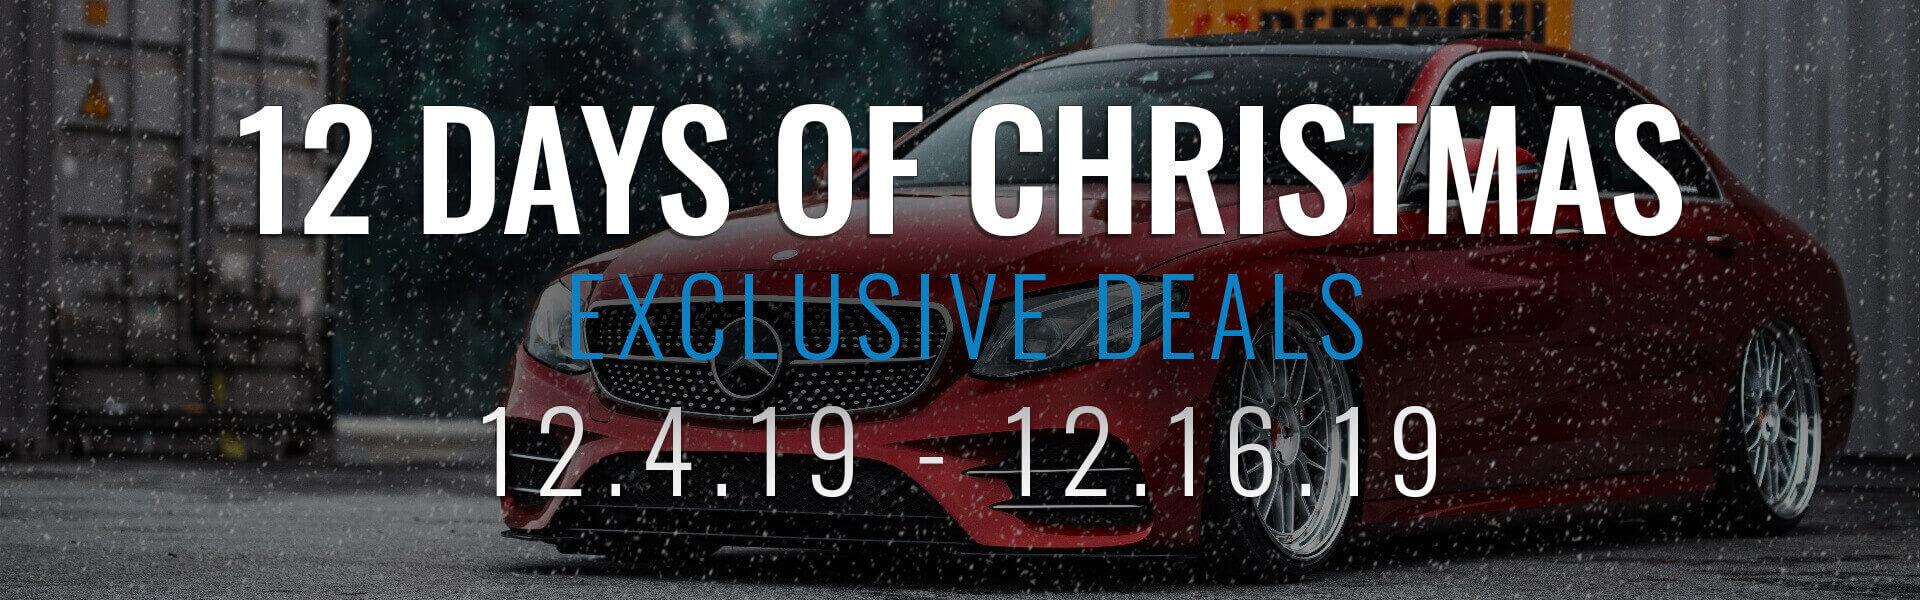 12 Days of Christmas Sale Banner Mobile